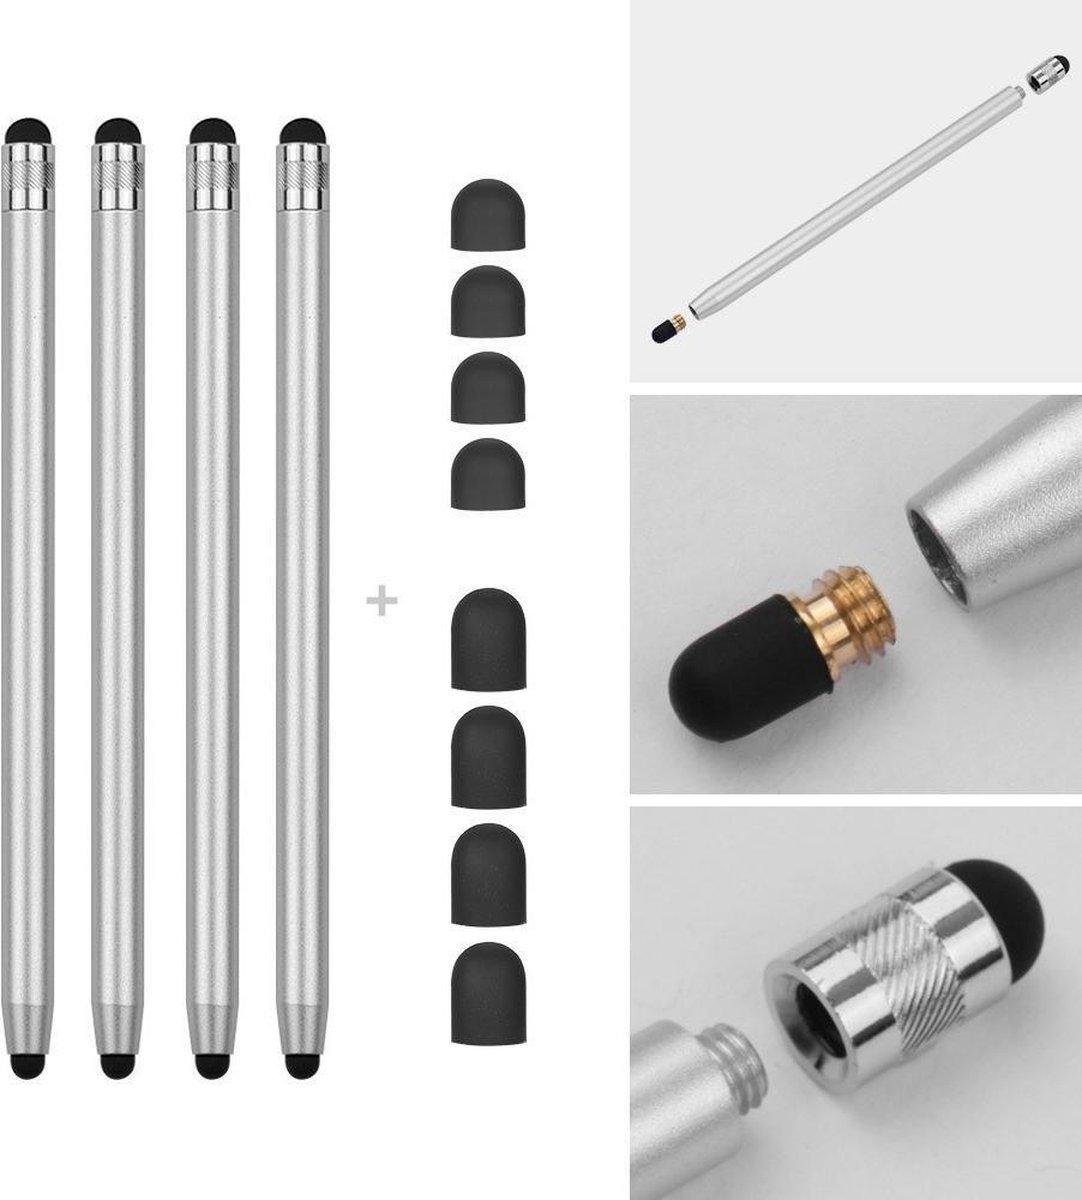 4 stuks - Stylus touchscreen pennetjes - Zilver